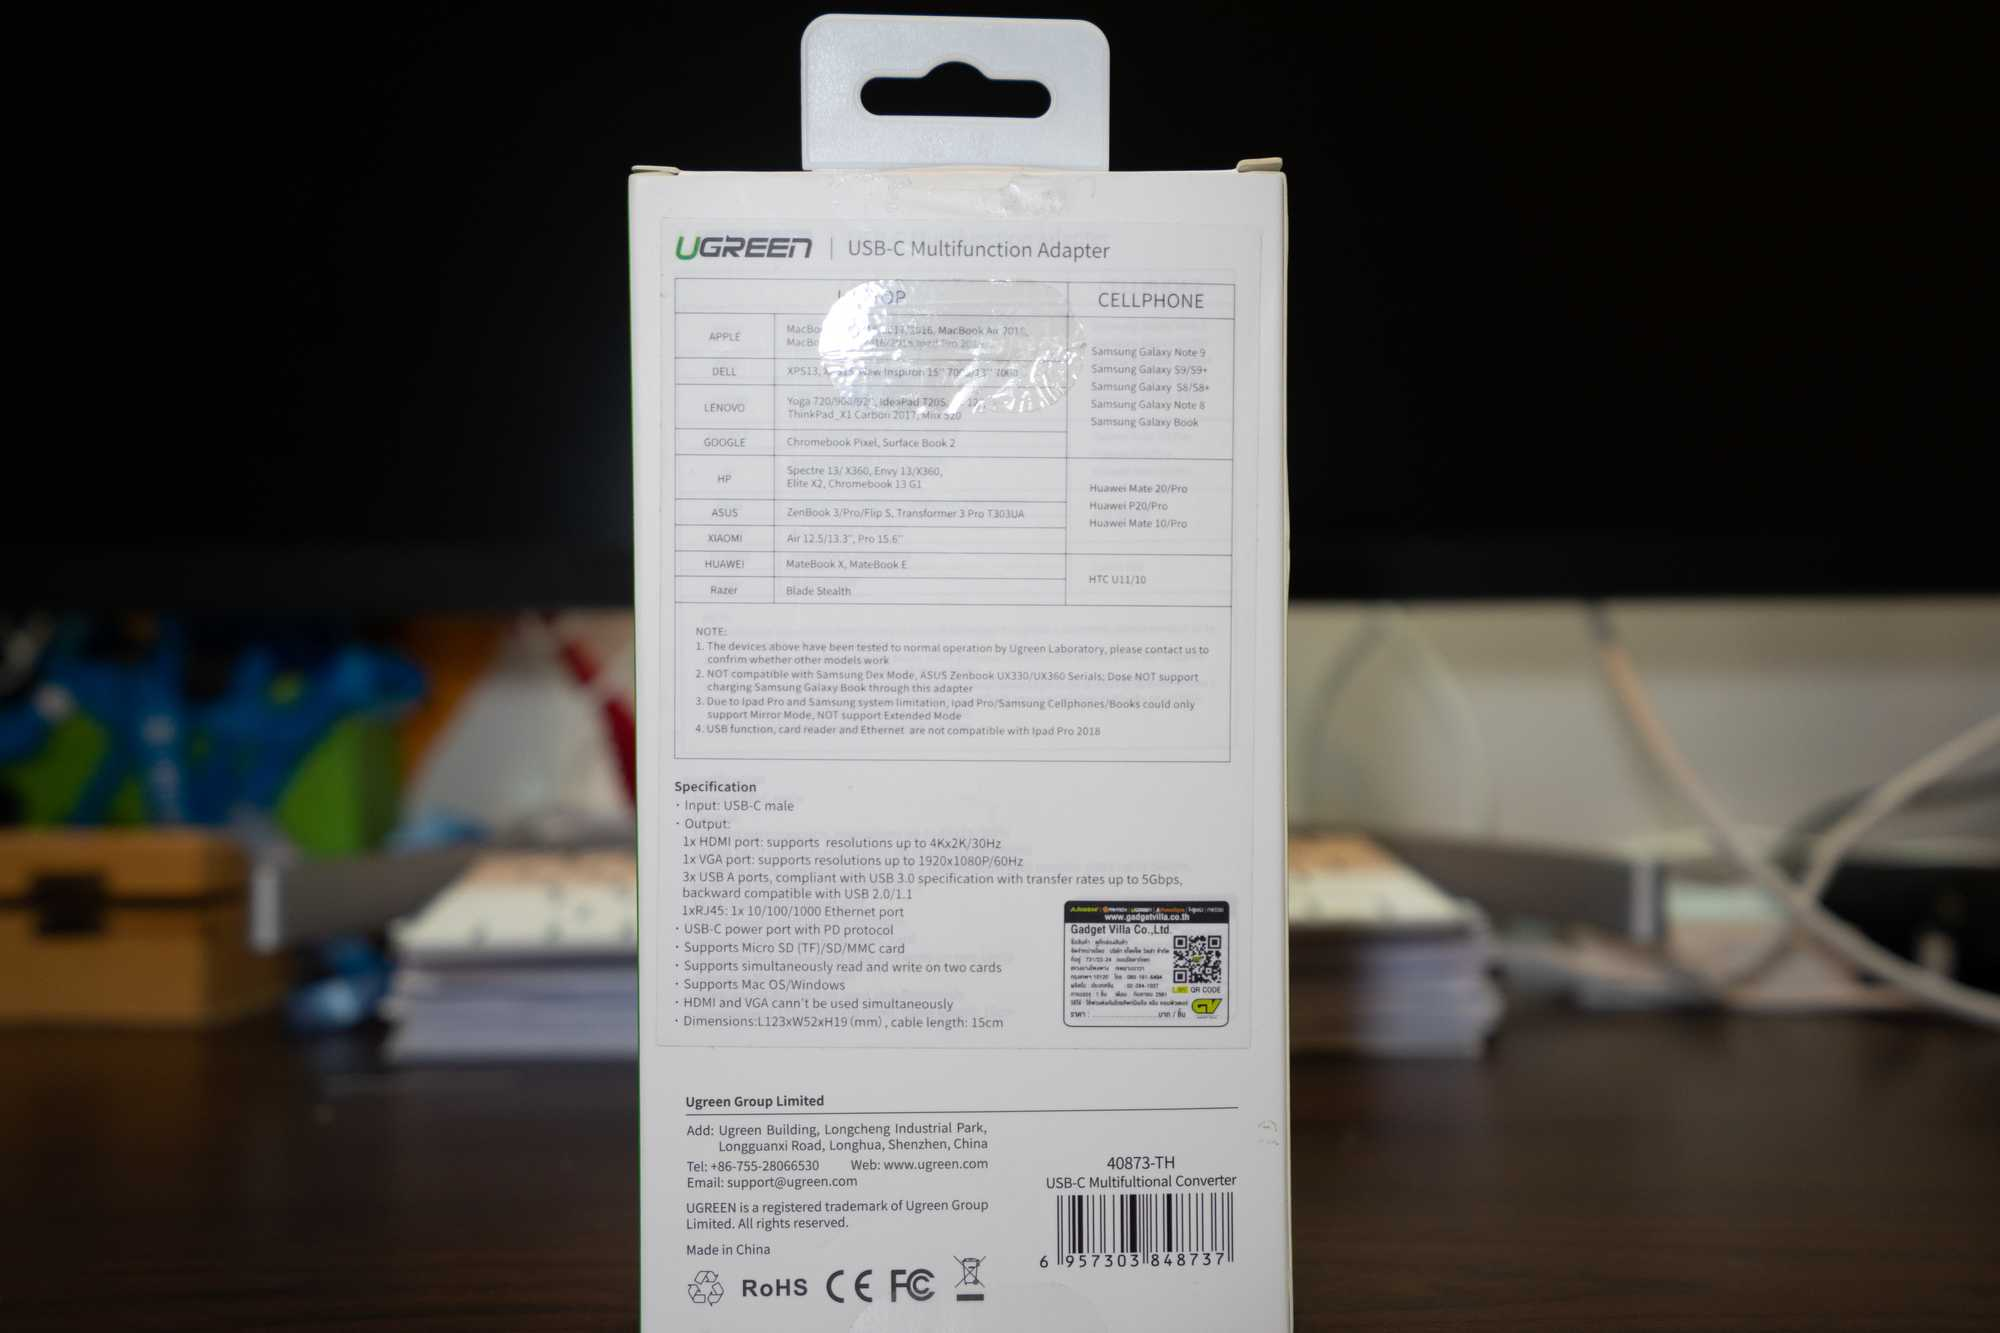 UGREEN USB-C 9-in 1 Multifunctional Adapter ด้านหลังกล่อง